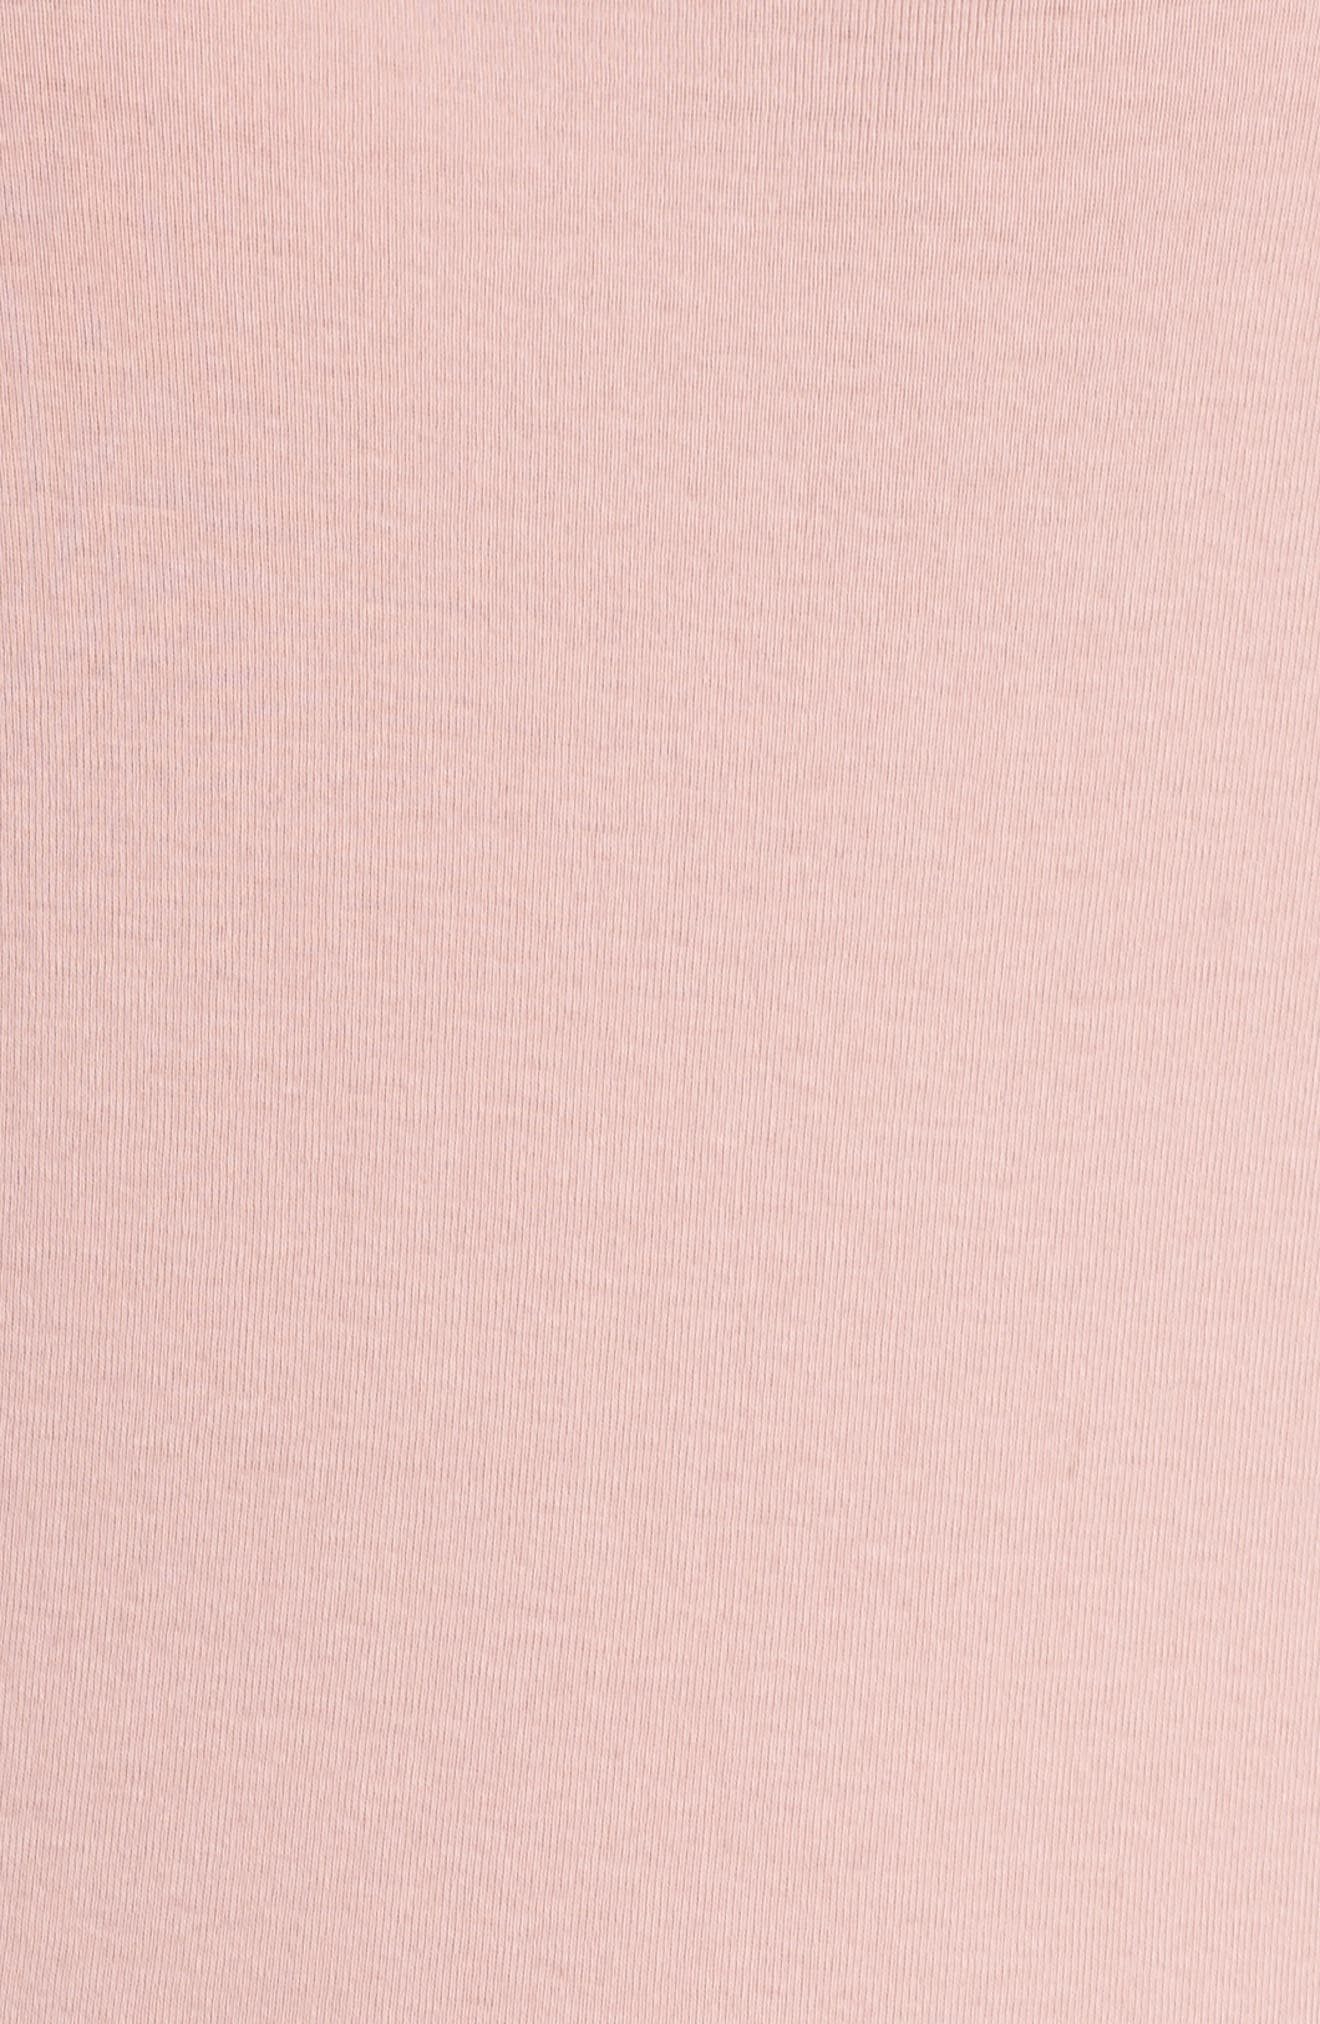 Ruffle Sleeve Sweatshirt,                             Alternate thumbnail 5, color,